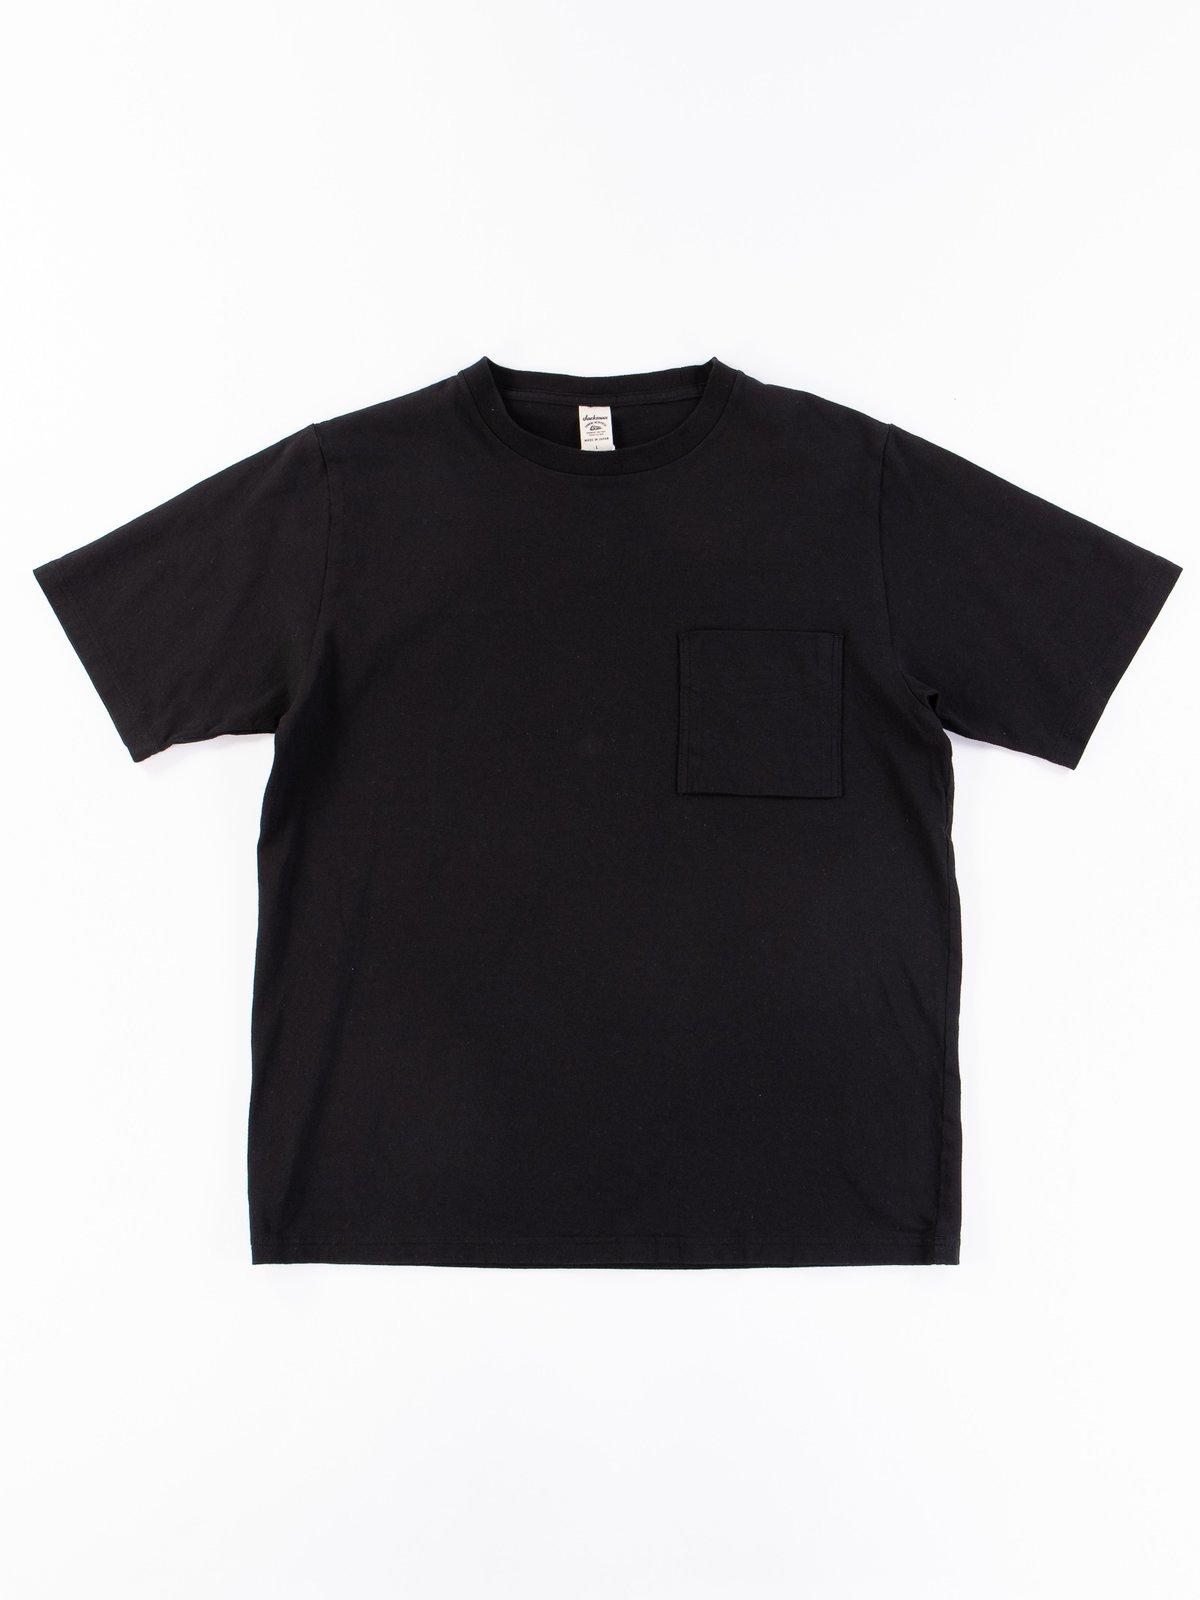 Black Pocket T–Shirt - Image 1